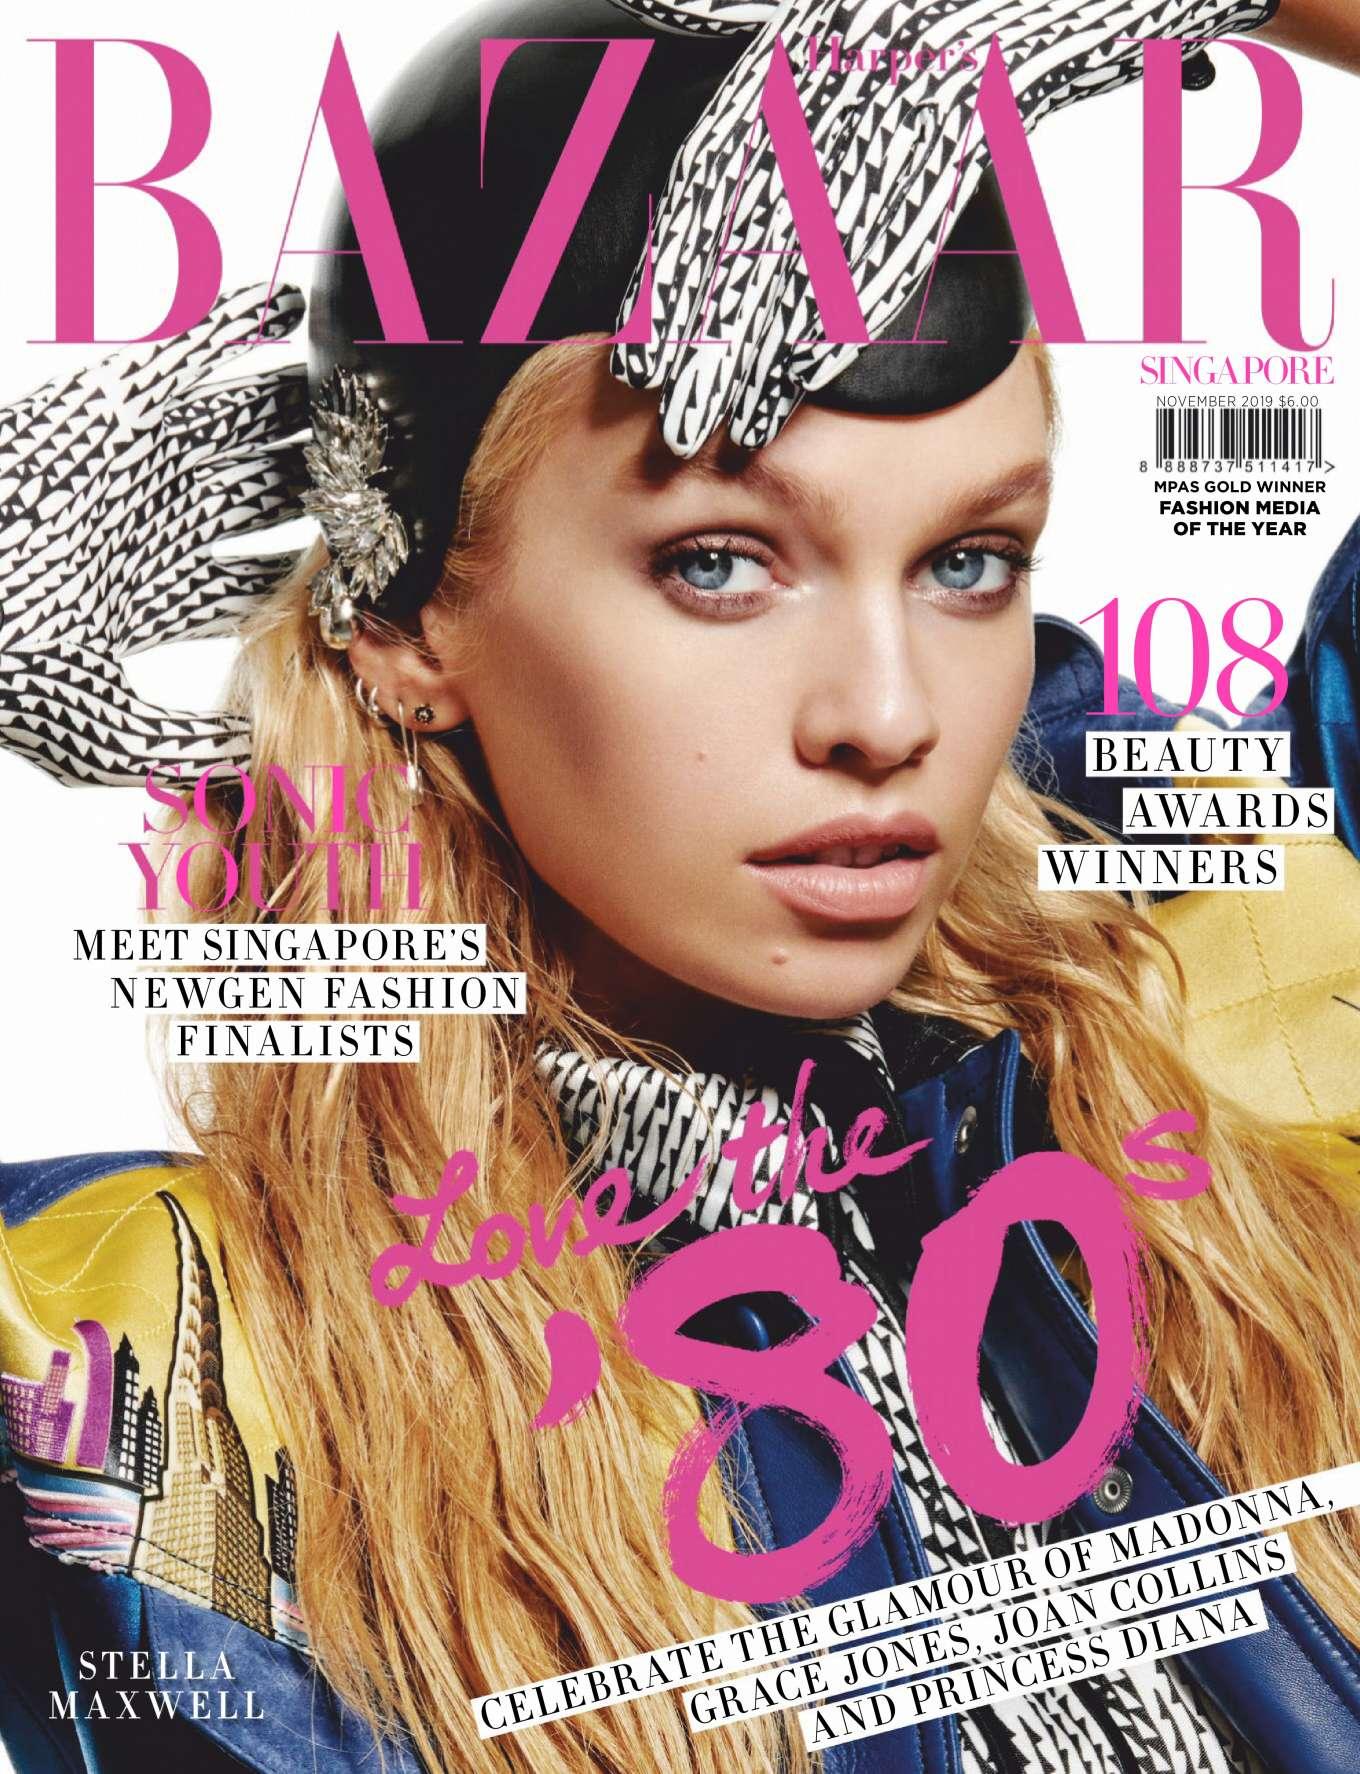 Stella Maxwell 2019 : Stella Maxwell – Harpers Bazaar Singapore 2019-08